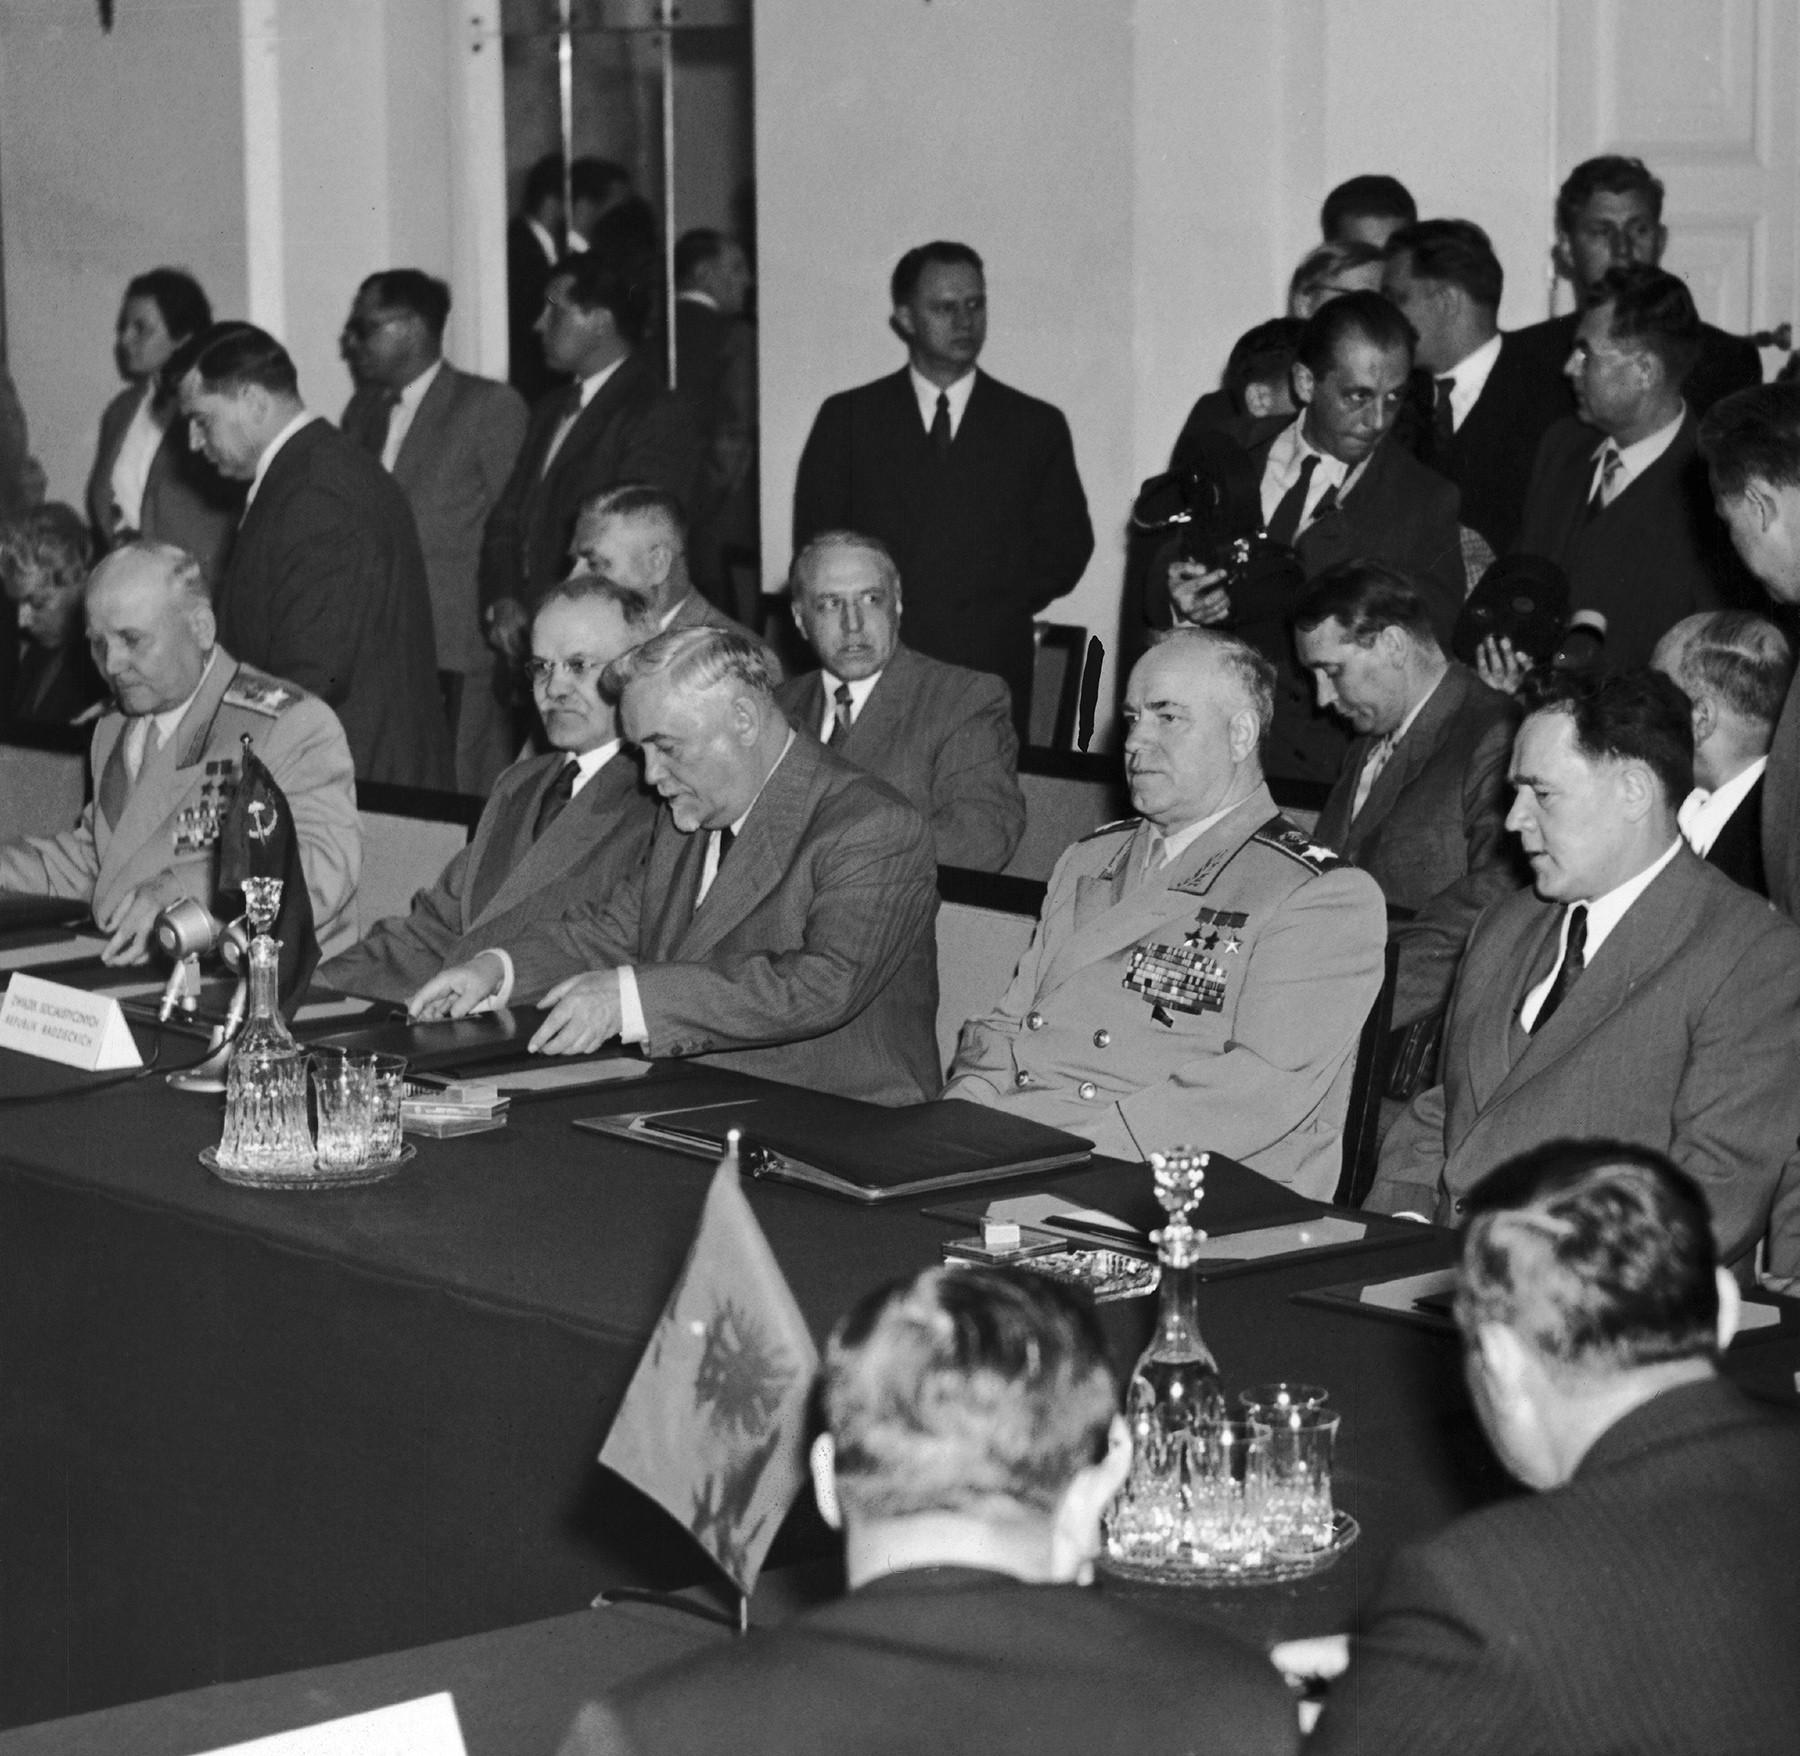 Делегация от СССР, България, Полша, Албания, Румъния и Китай, 14 май 1955 г.